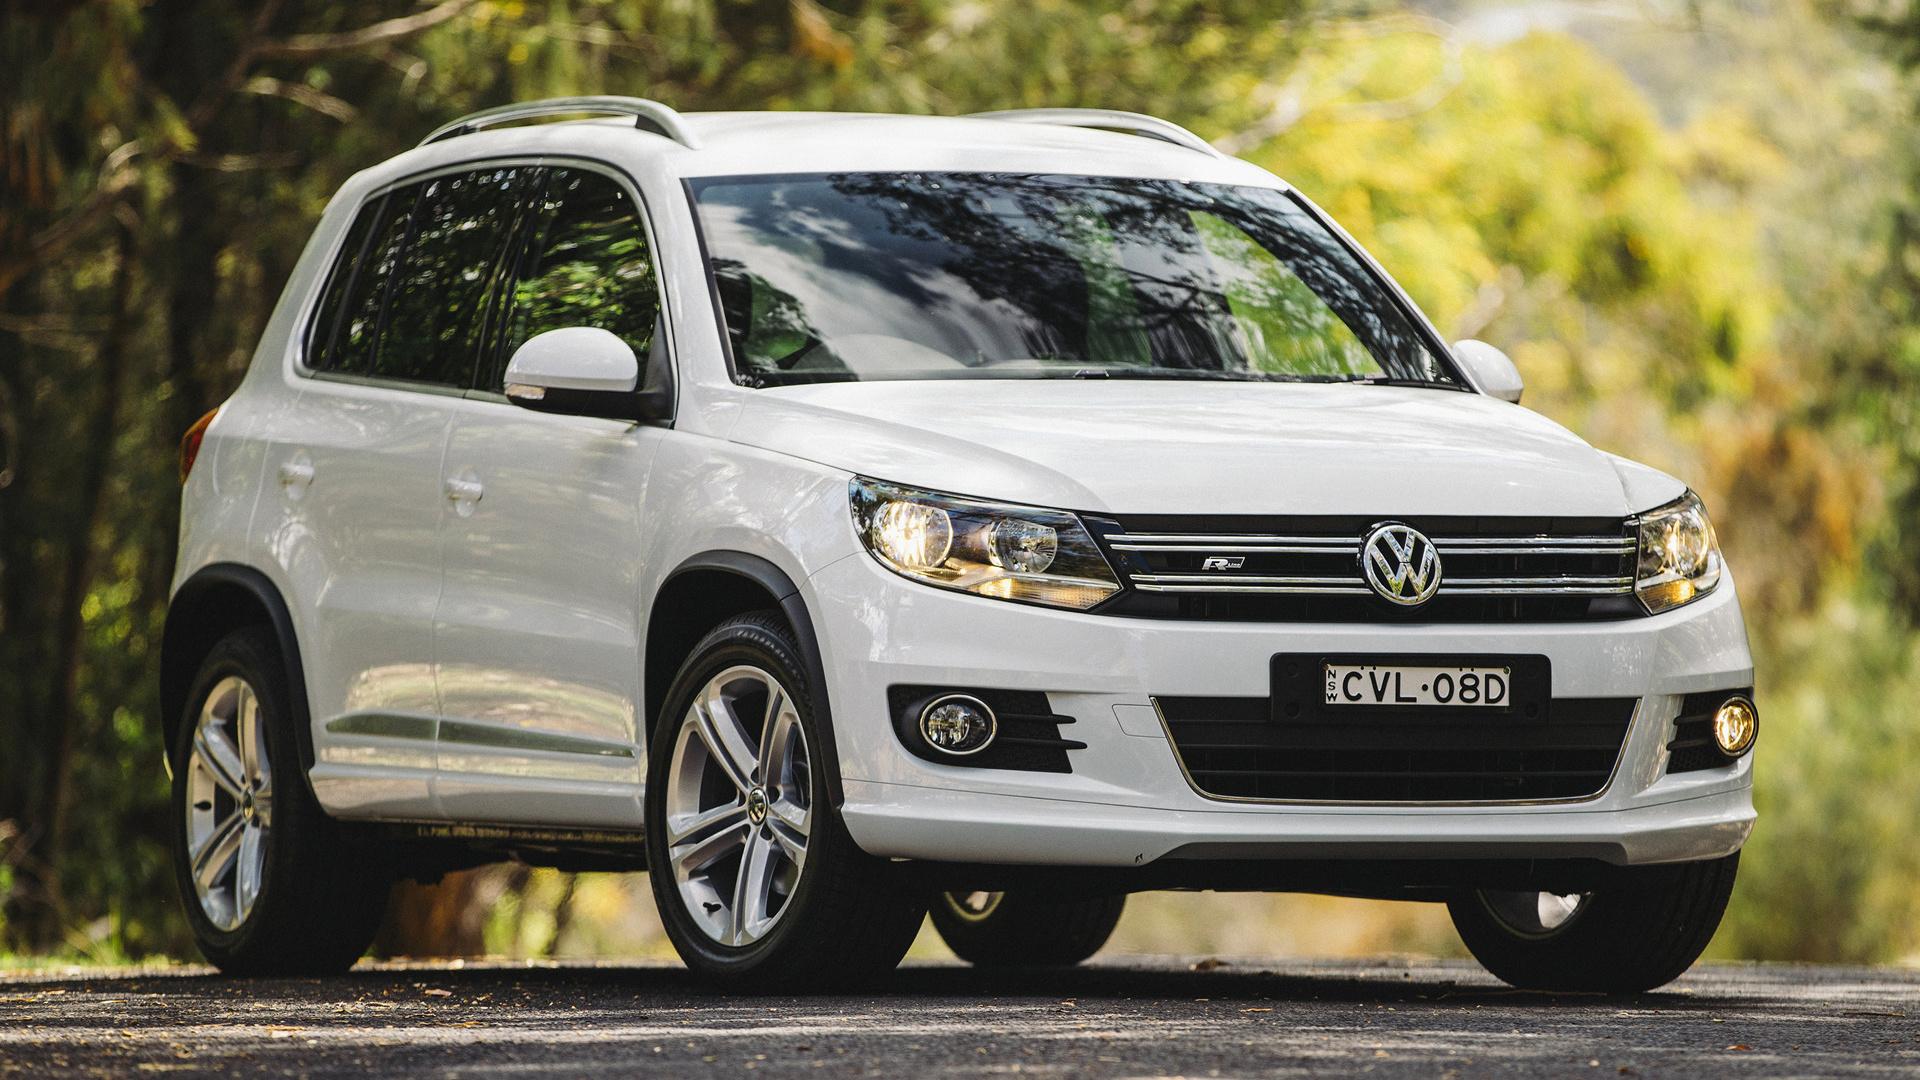 Volkswagen Tiguan R-Line (2014) AU Wallpapers and HD Images - Car Pixel